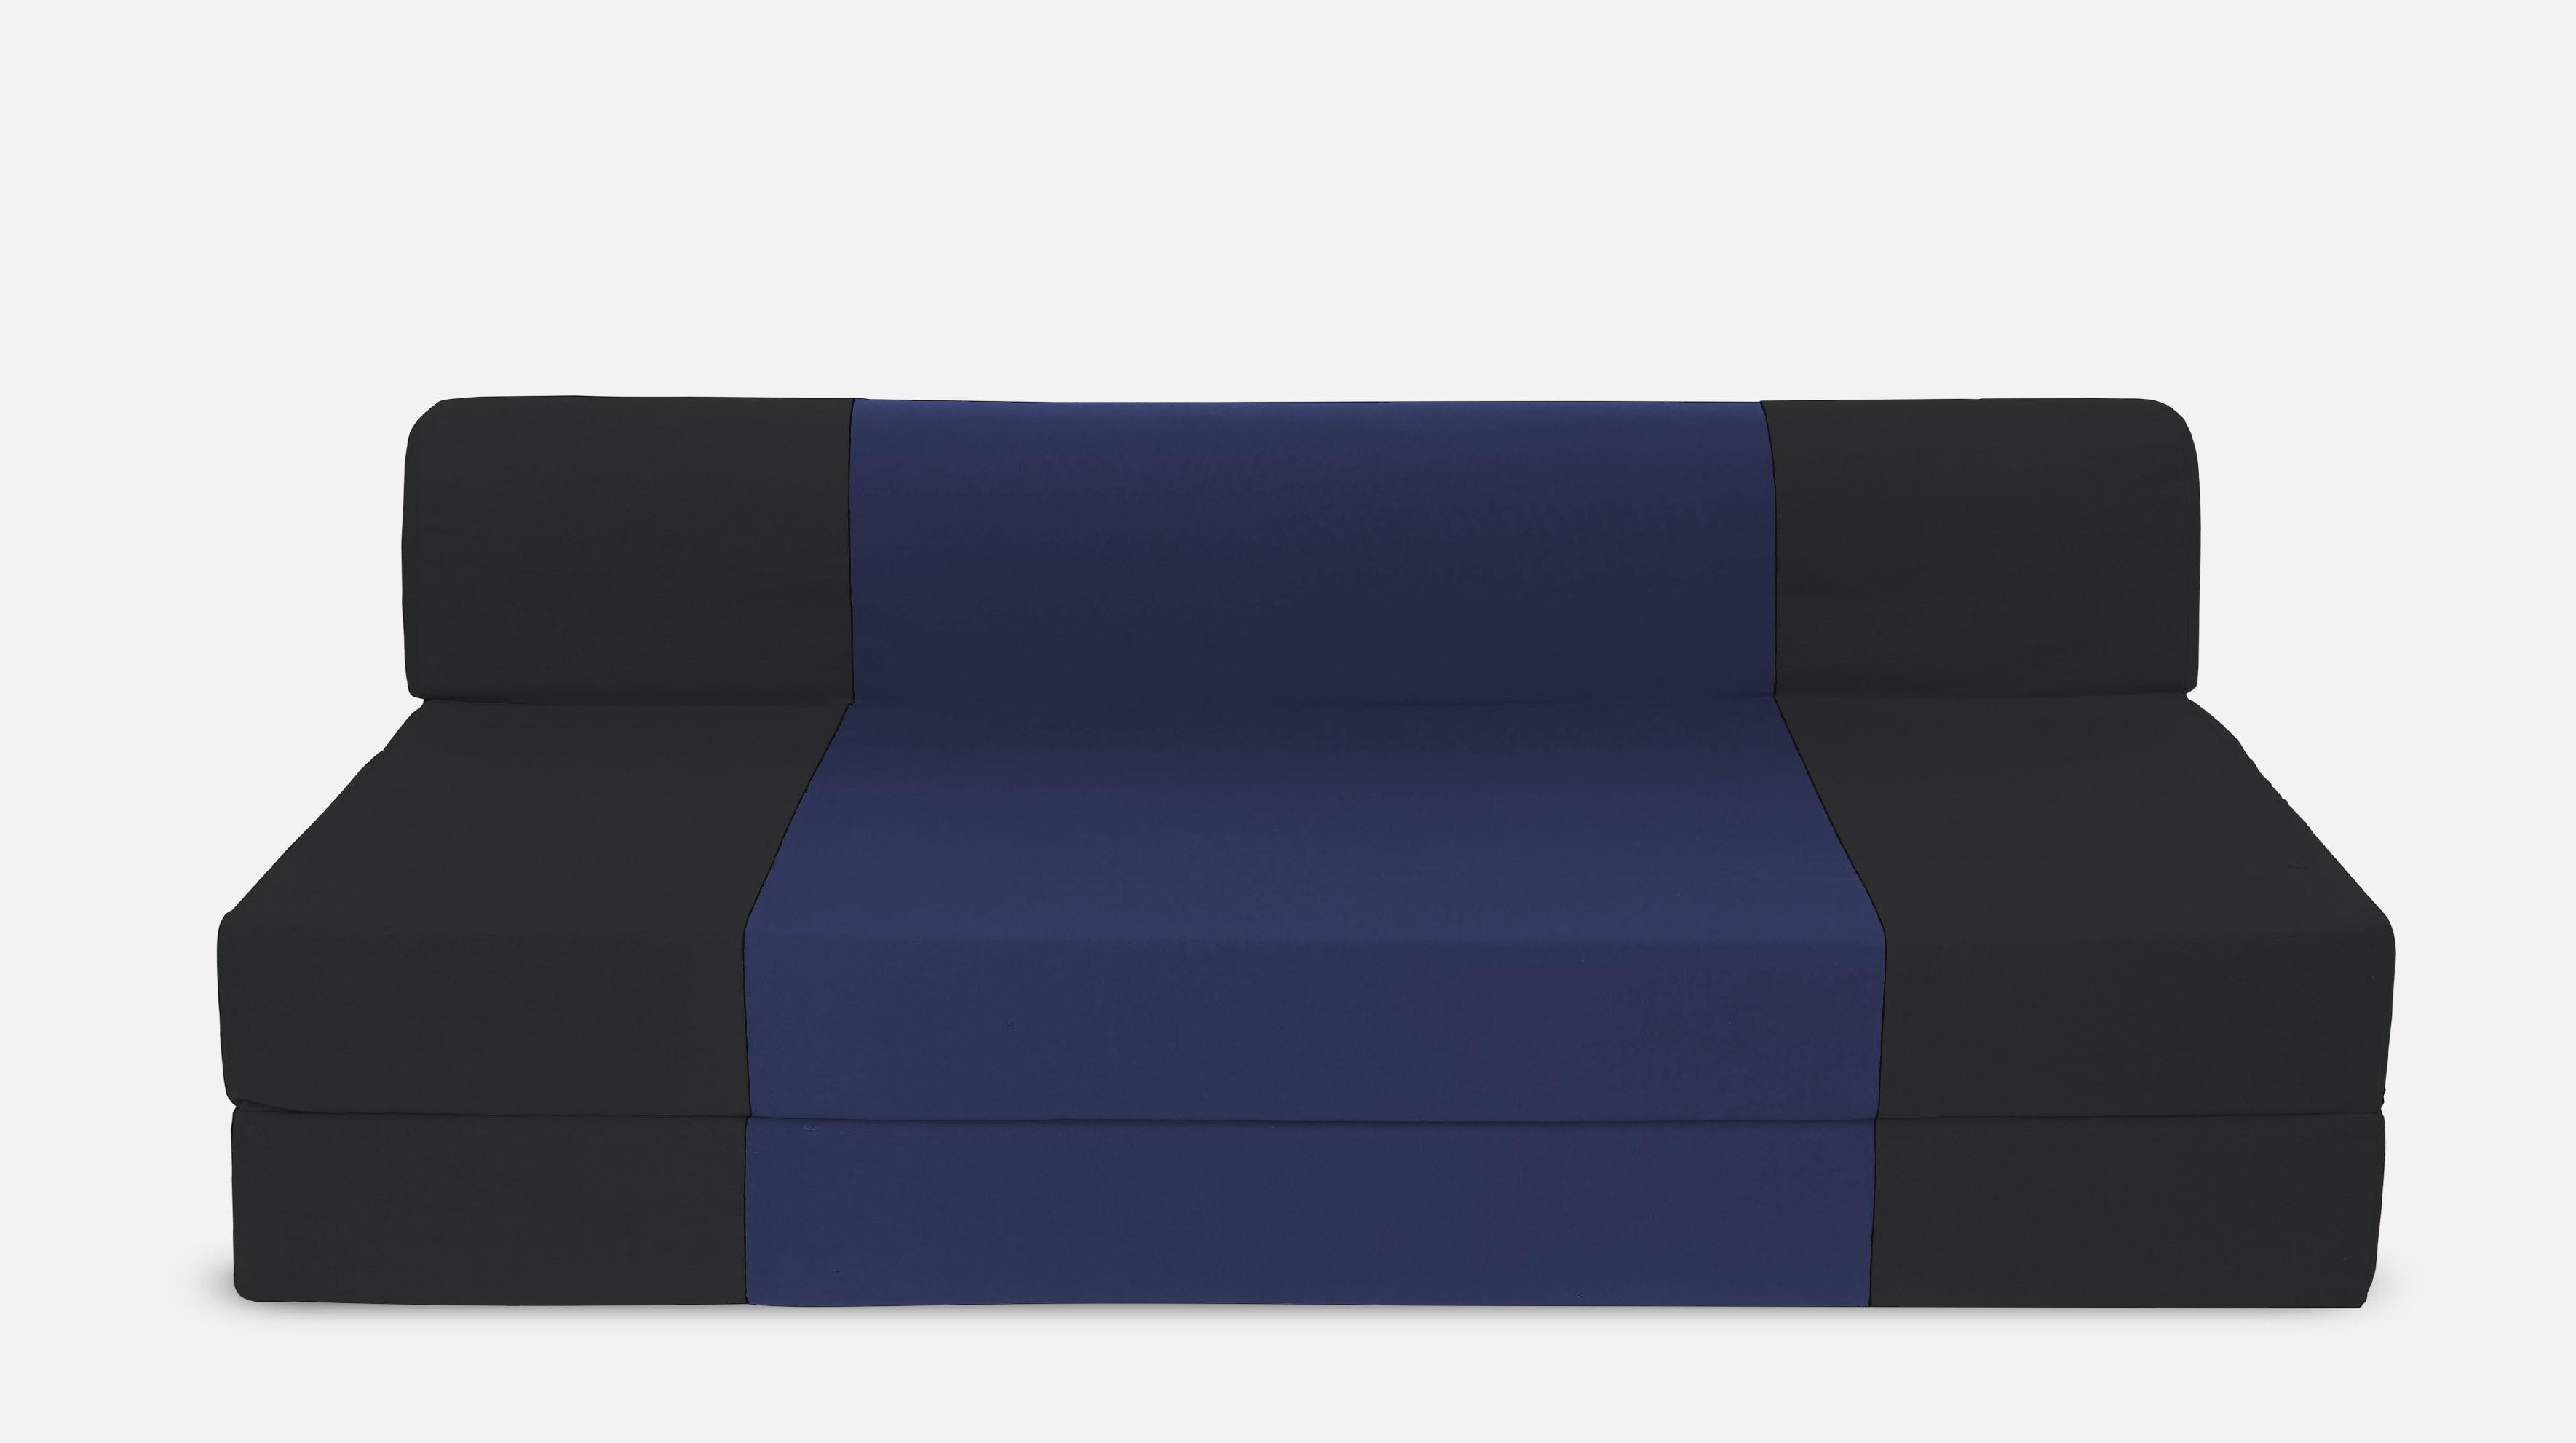 Folding Foam Sofa Bed India Benefits Of Using The Foam ...